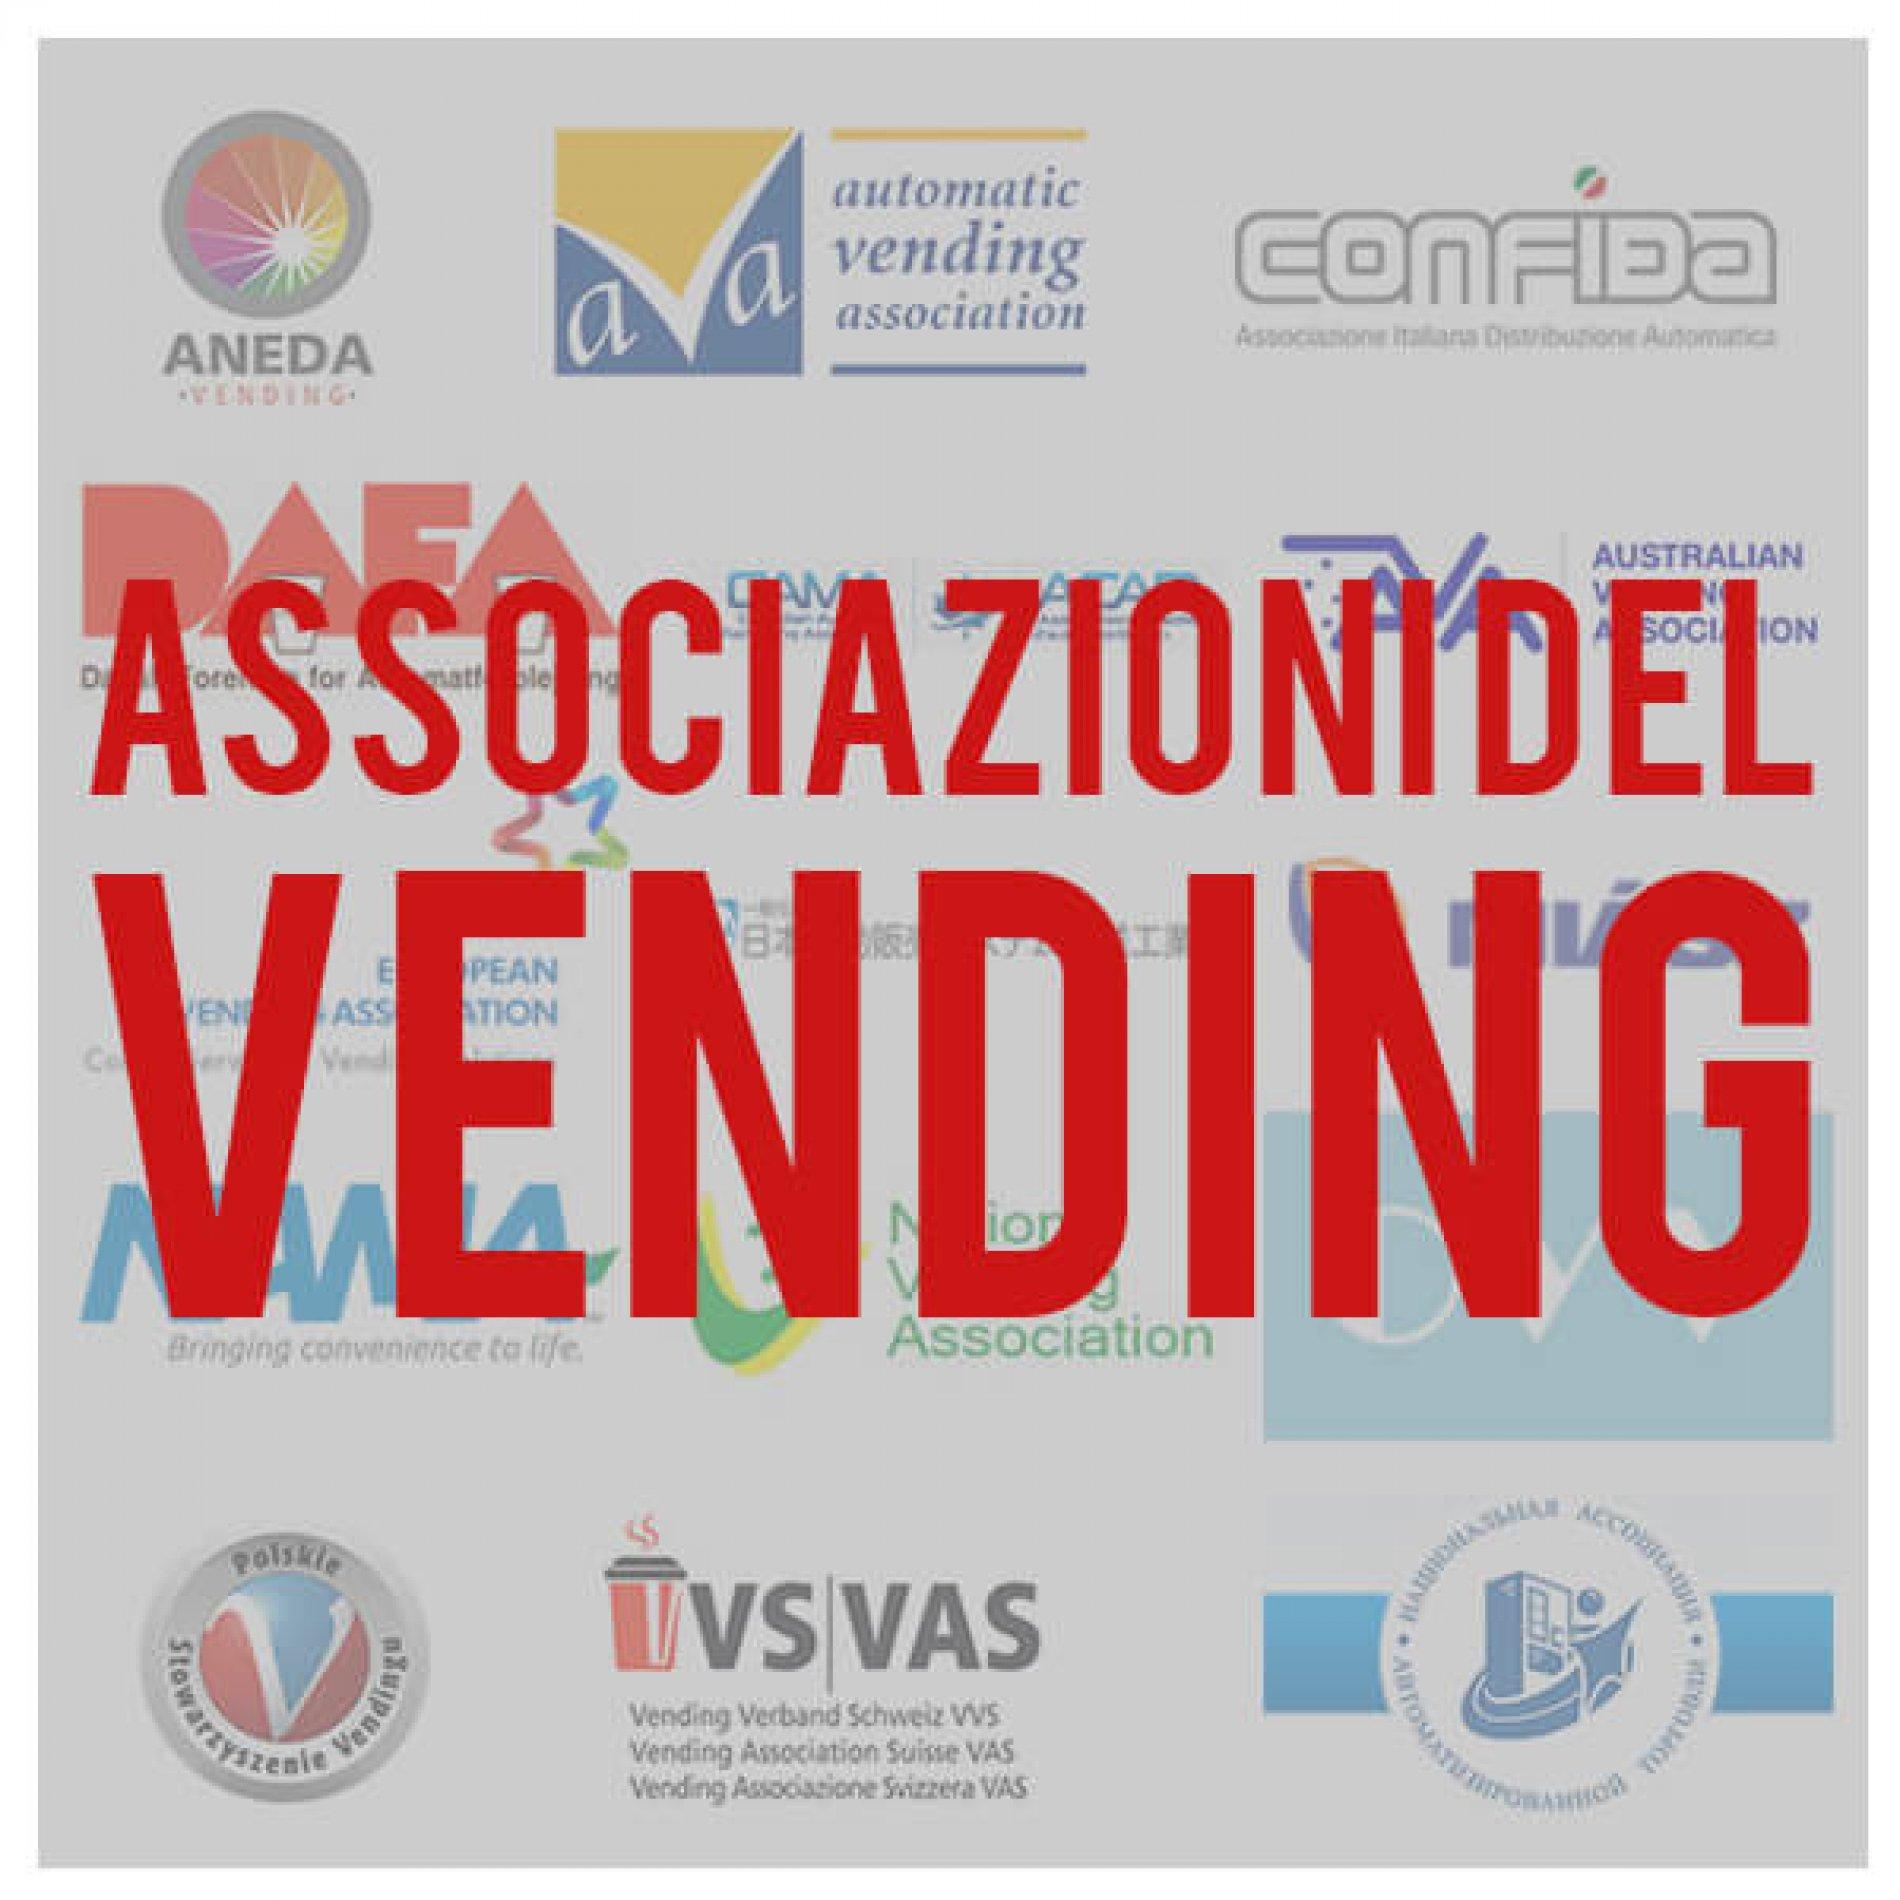 Associazioni del Vending